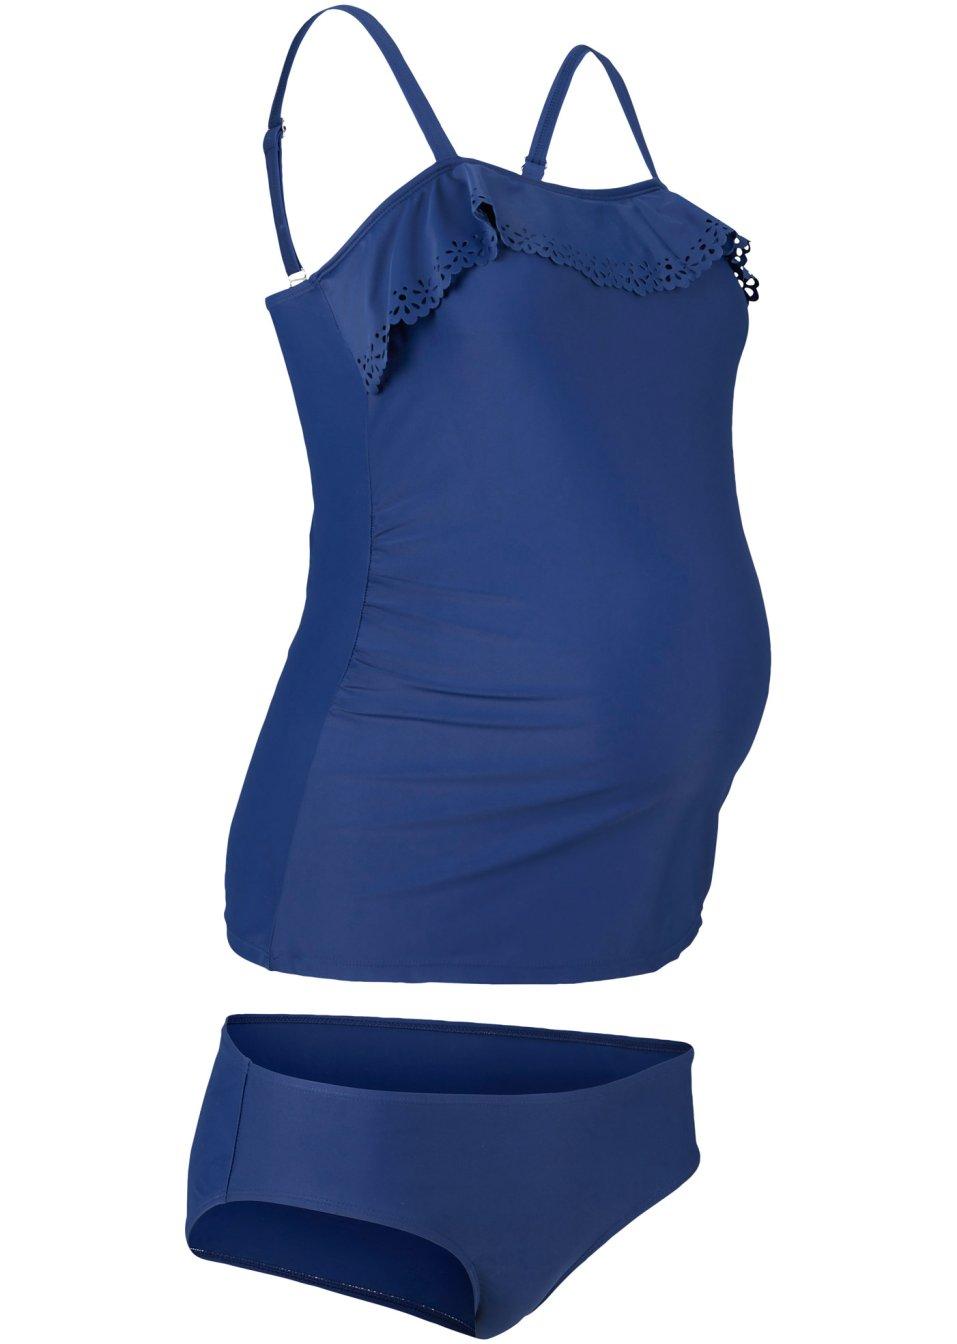 Umstandstankini (2-tlg. Set) blau - Damen - bonprix.de CvcP5 URQmc